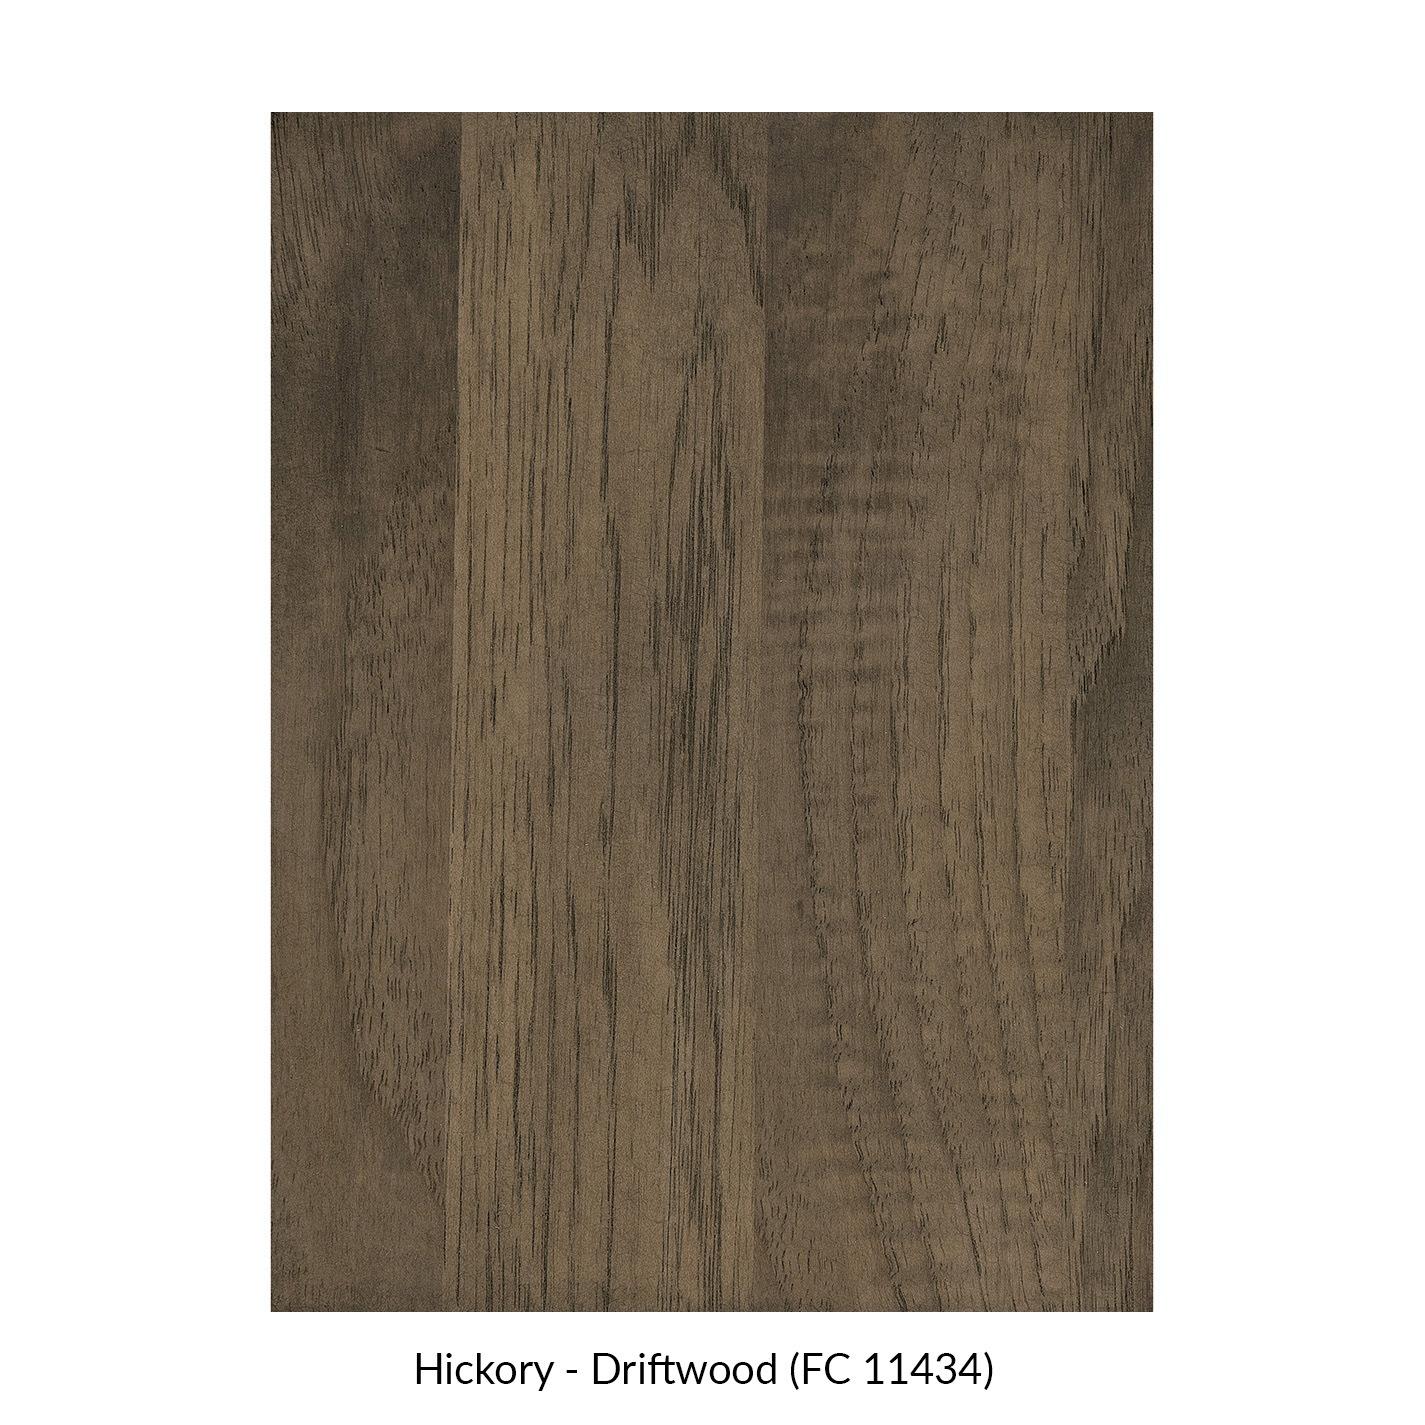 spectrum-hickory-driftwood-fc-11434.jpg